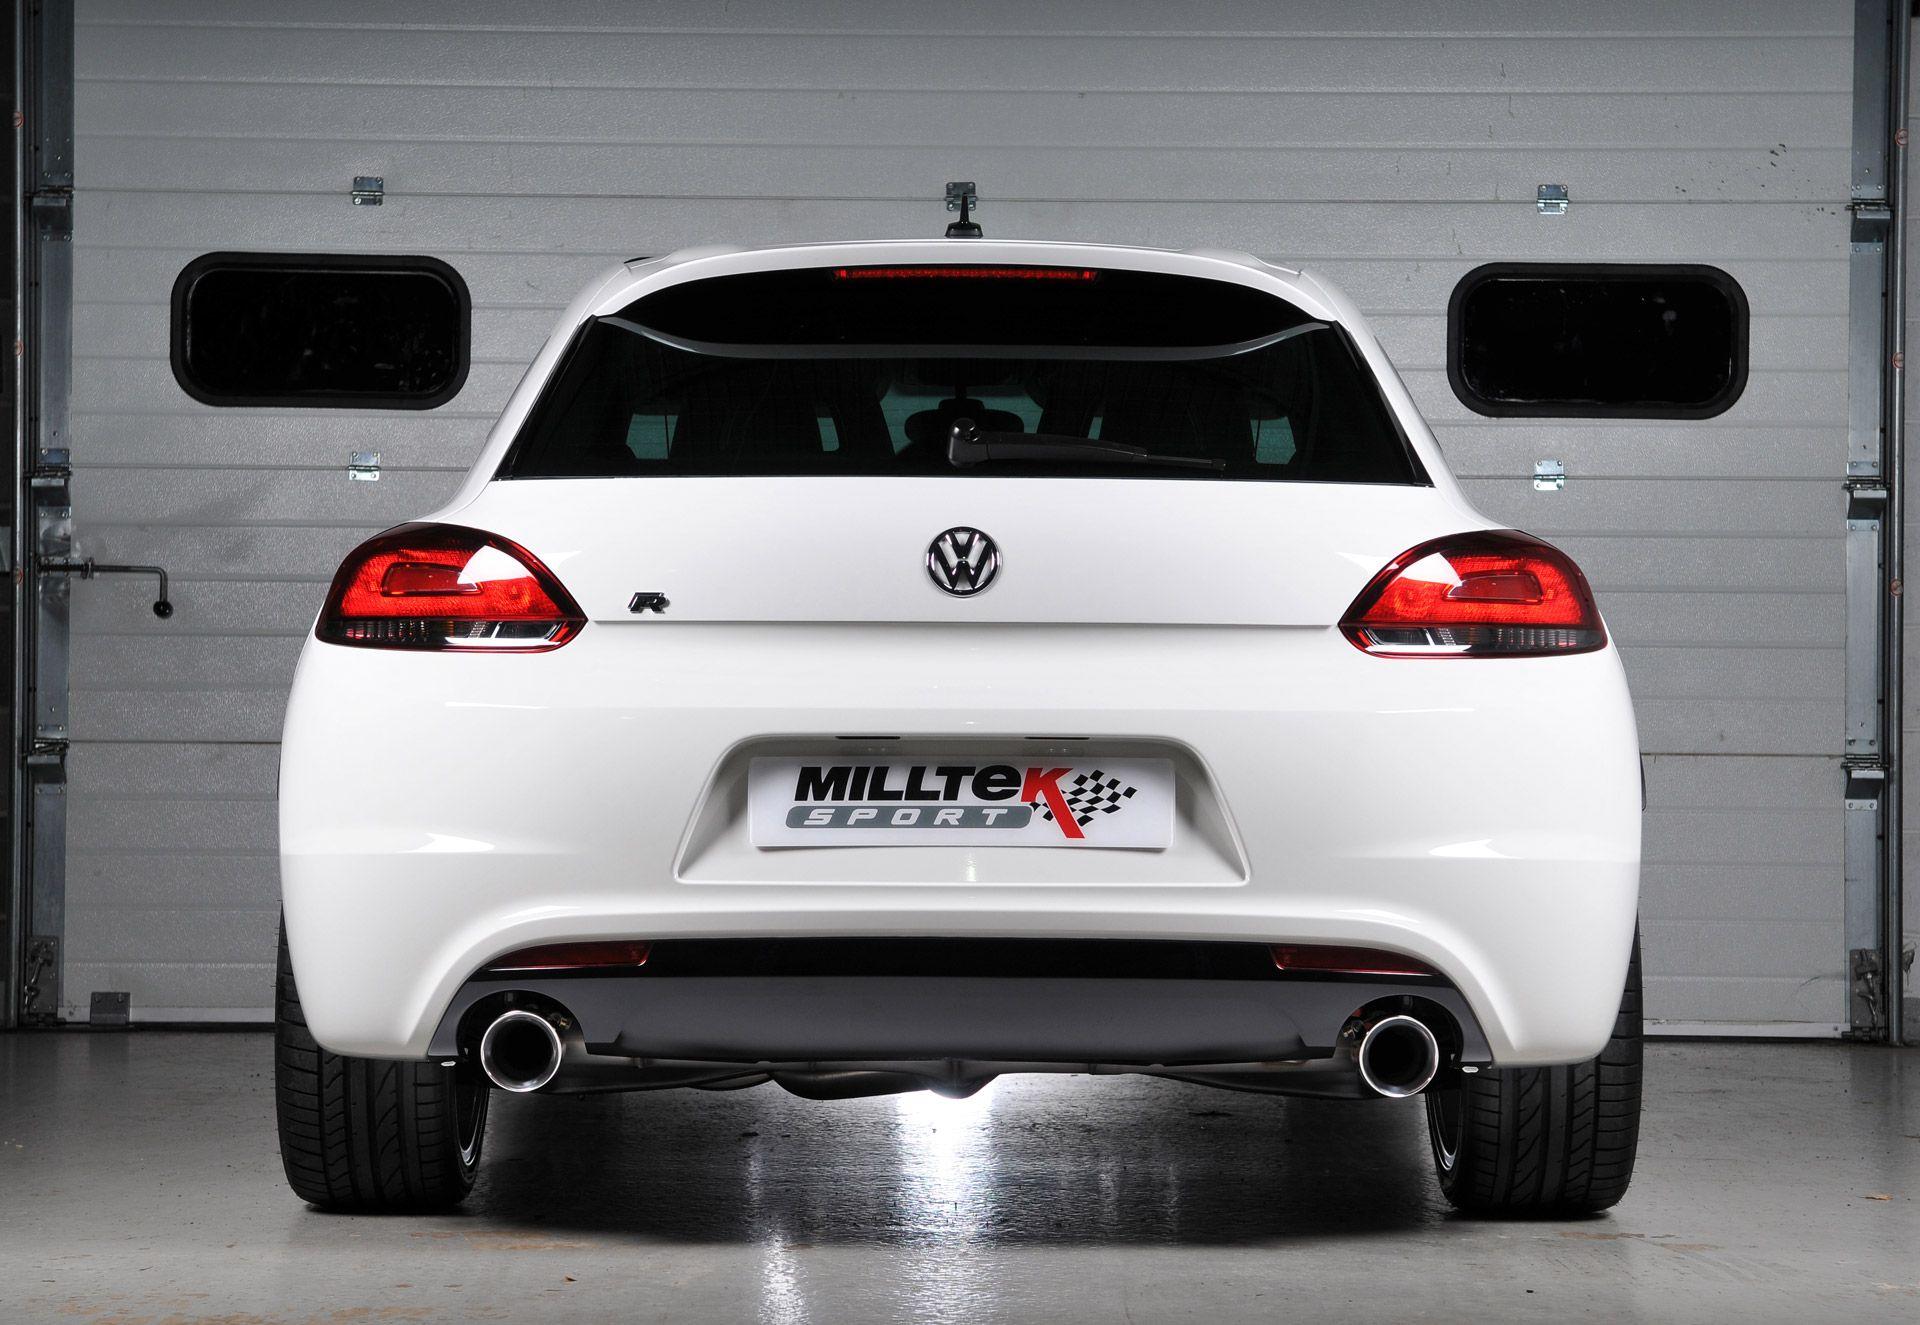 Milltek Sport Volkswagen Scirocco R Turbo Back Exhaust Including Hi Flow Sports Cat Ssxvw186 Milltek Roadrunner Motorsport